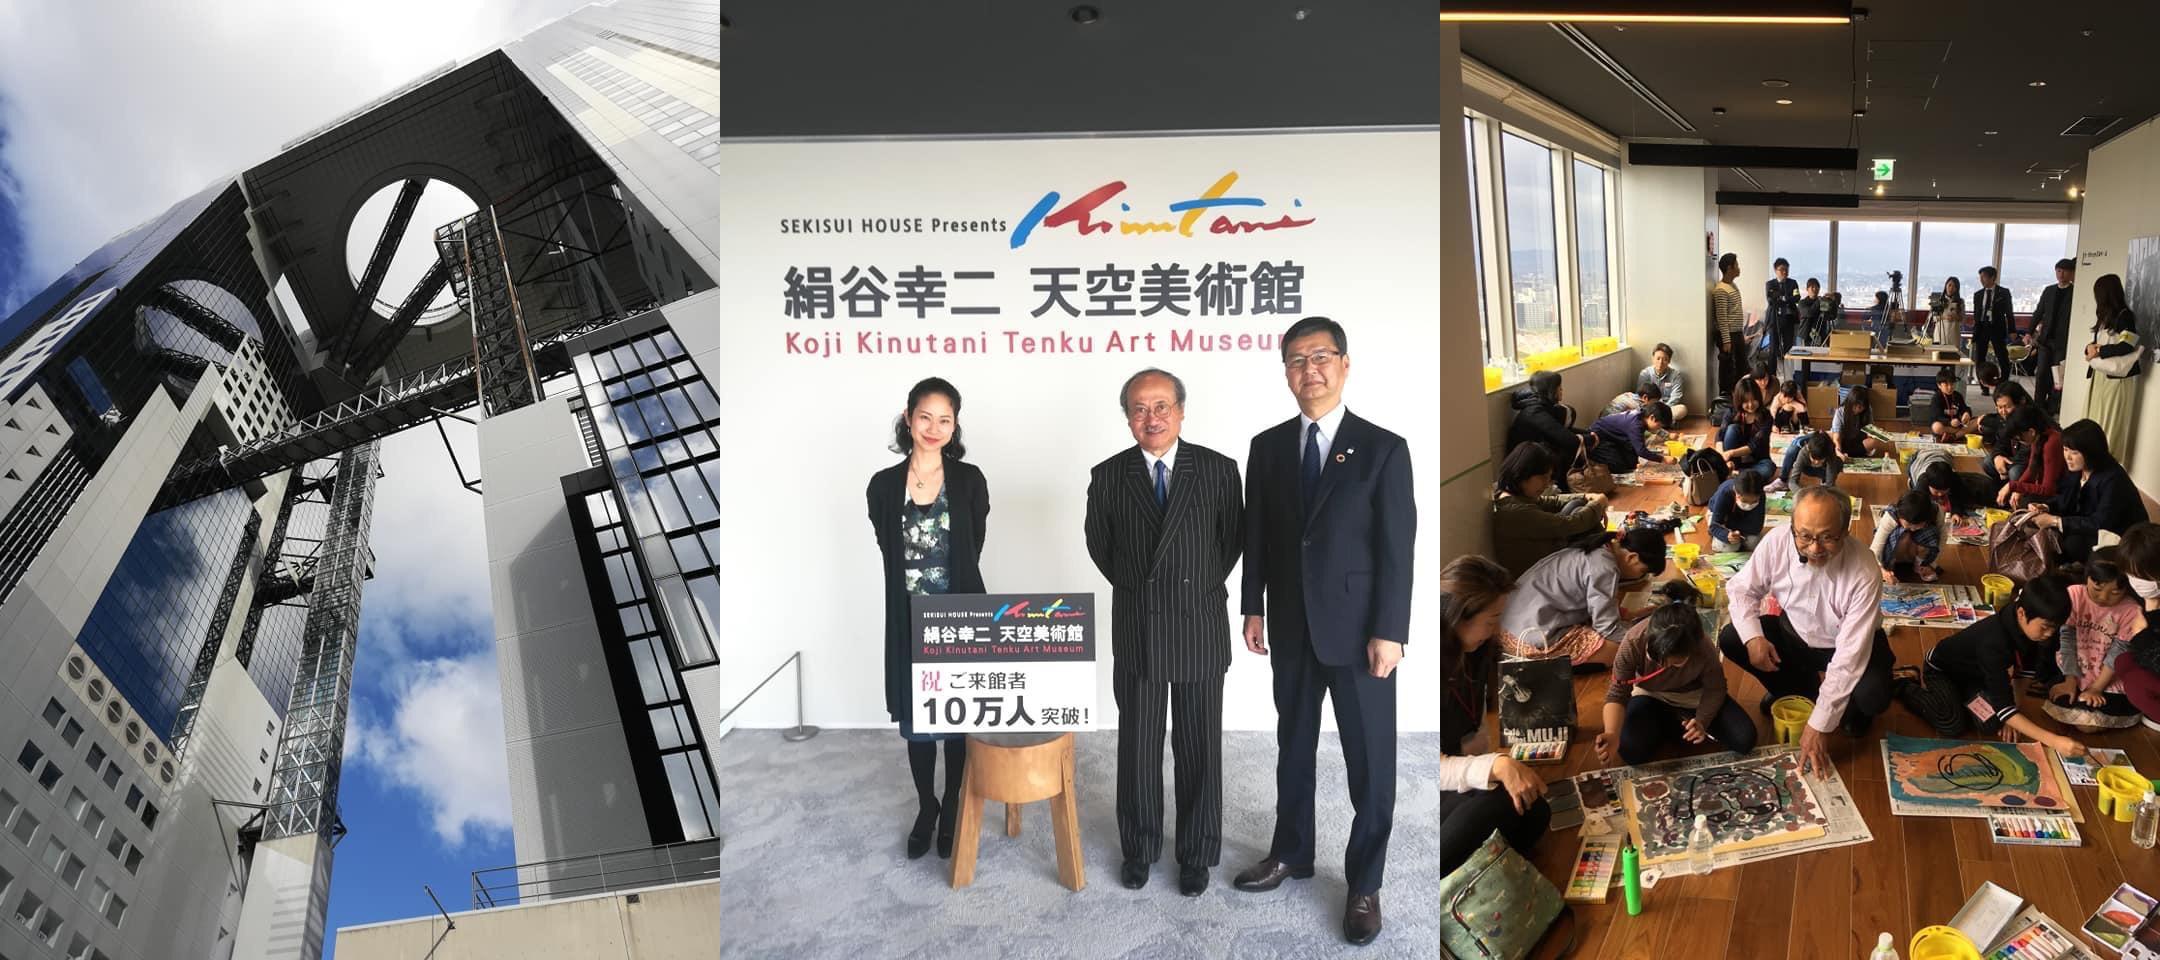 https://kinutani.jp/news/about/20200512.jpg